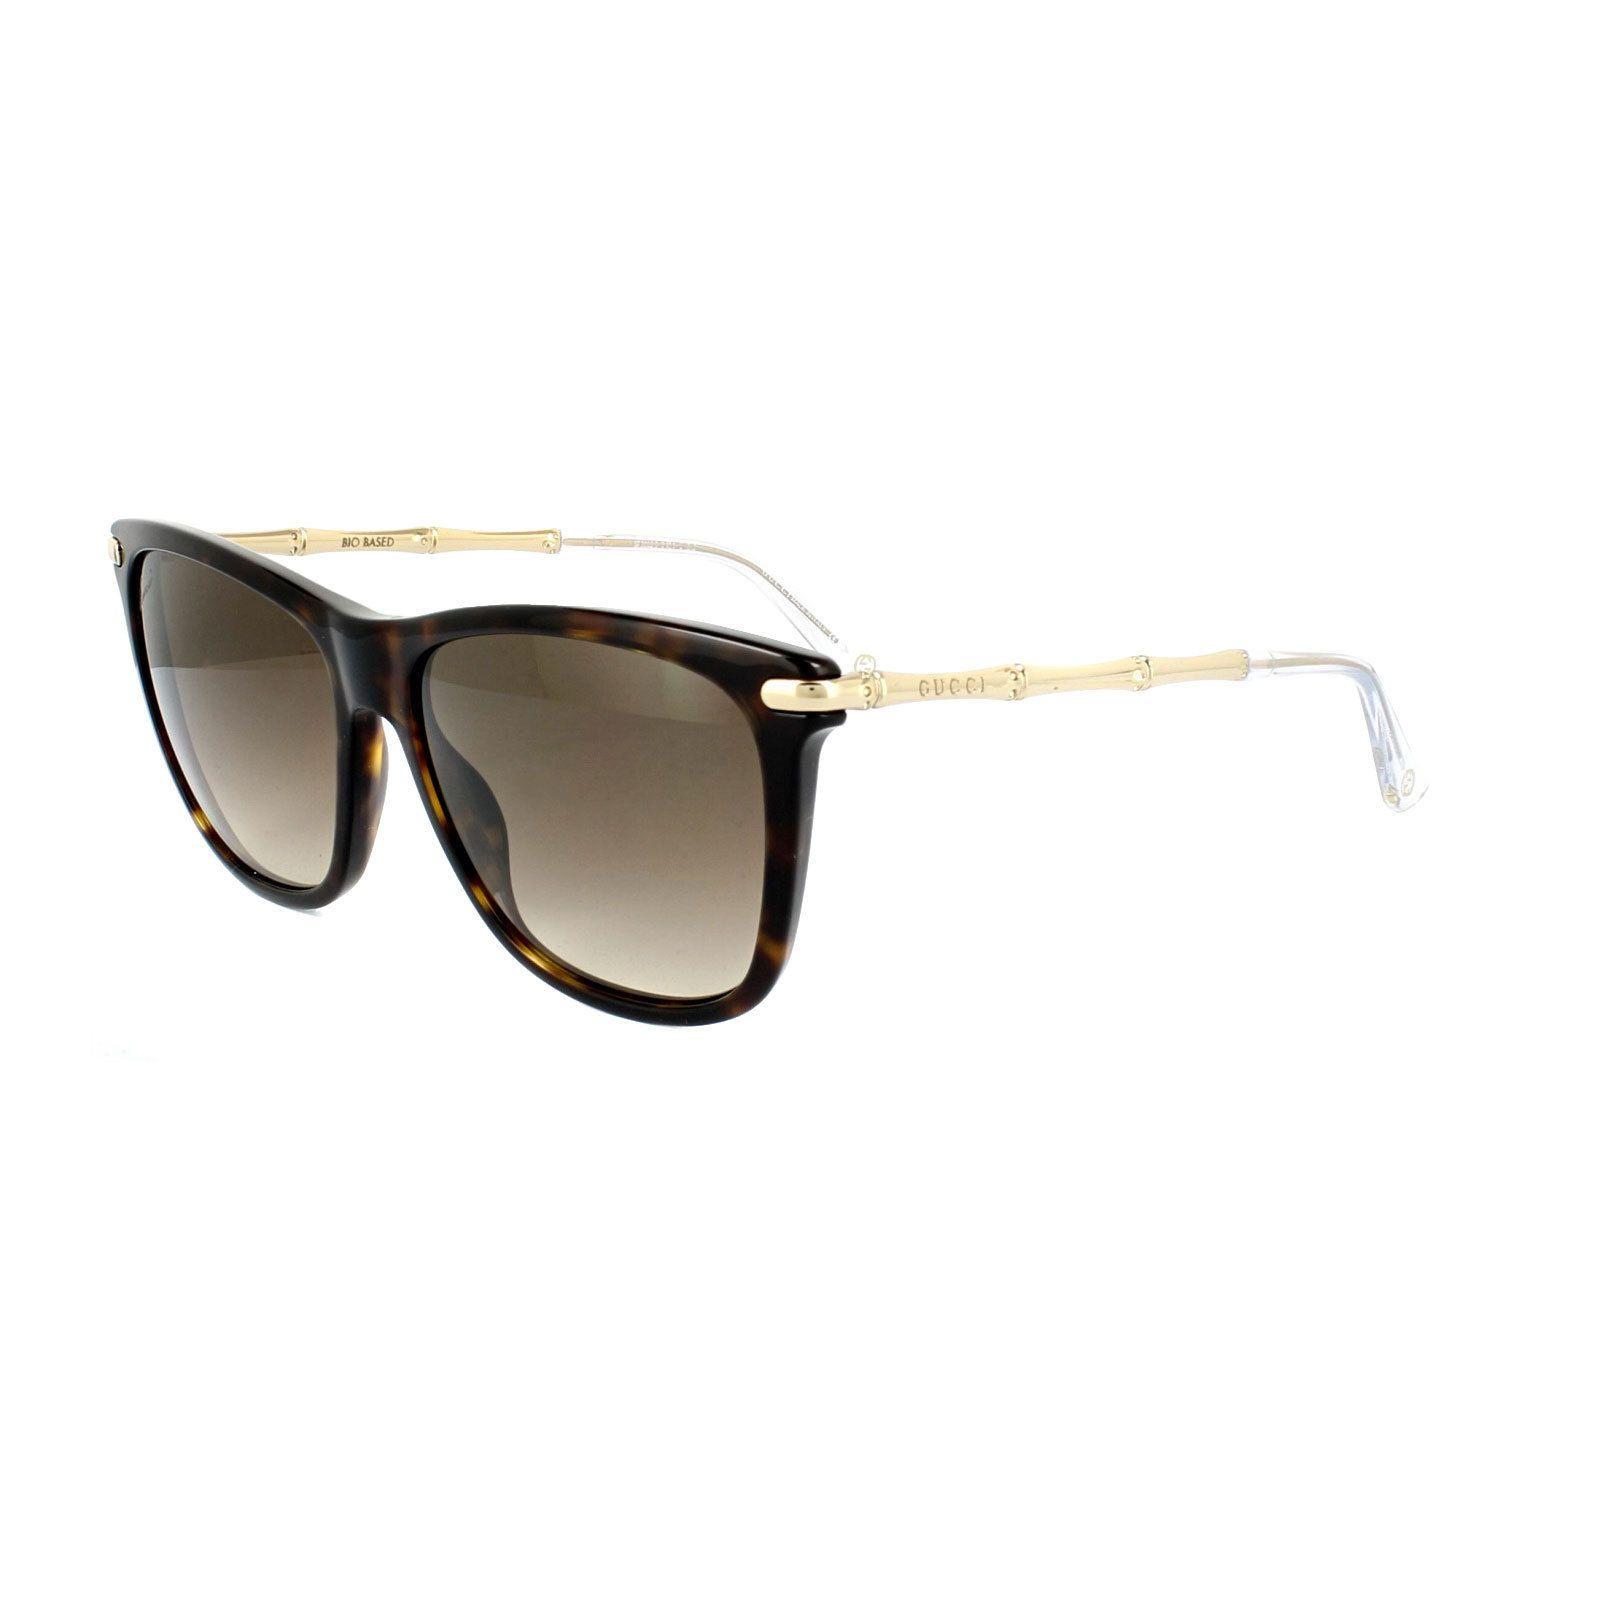 Gold Brown Havana Tortoiseshell Sunglasses Gucci tSgjw